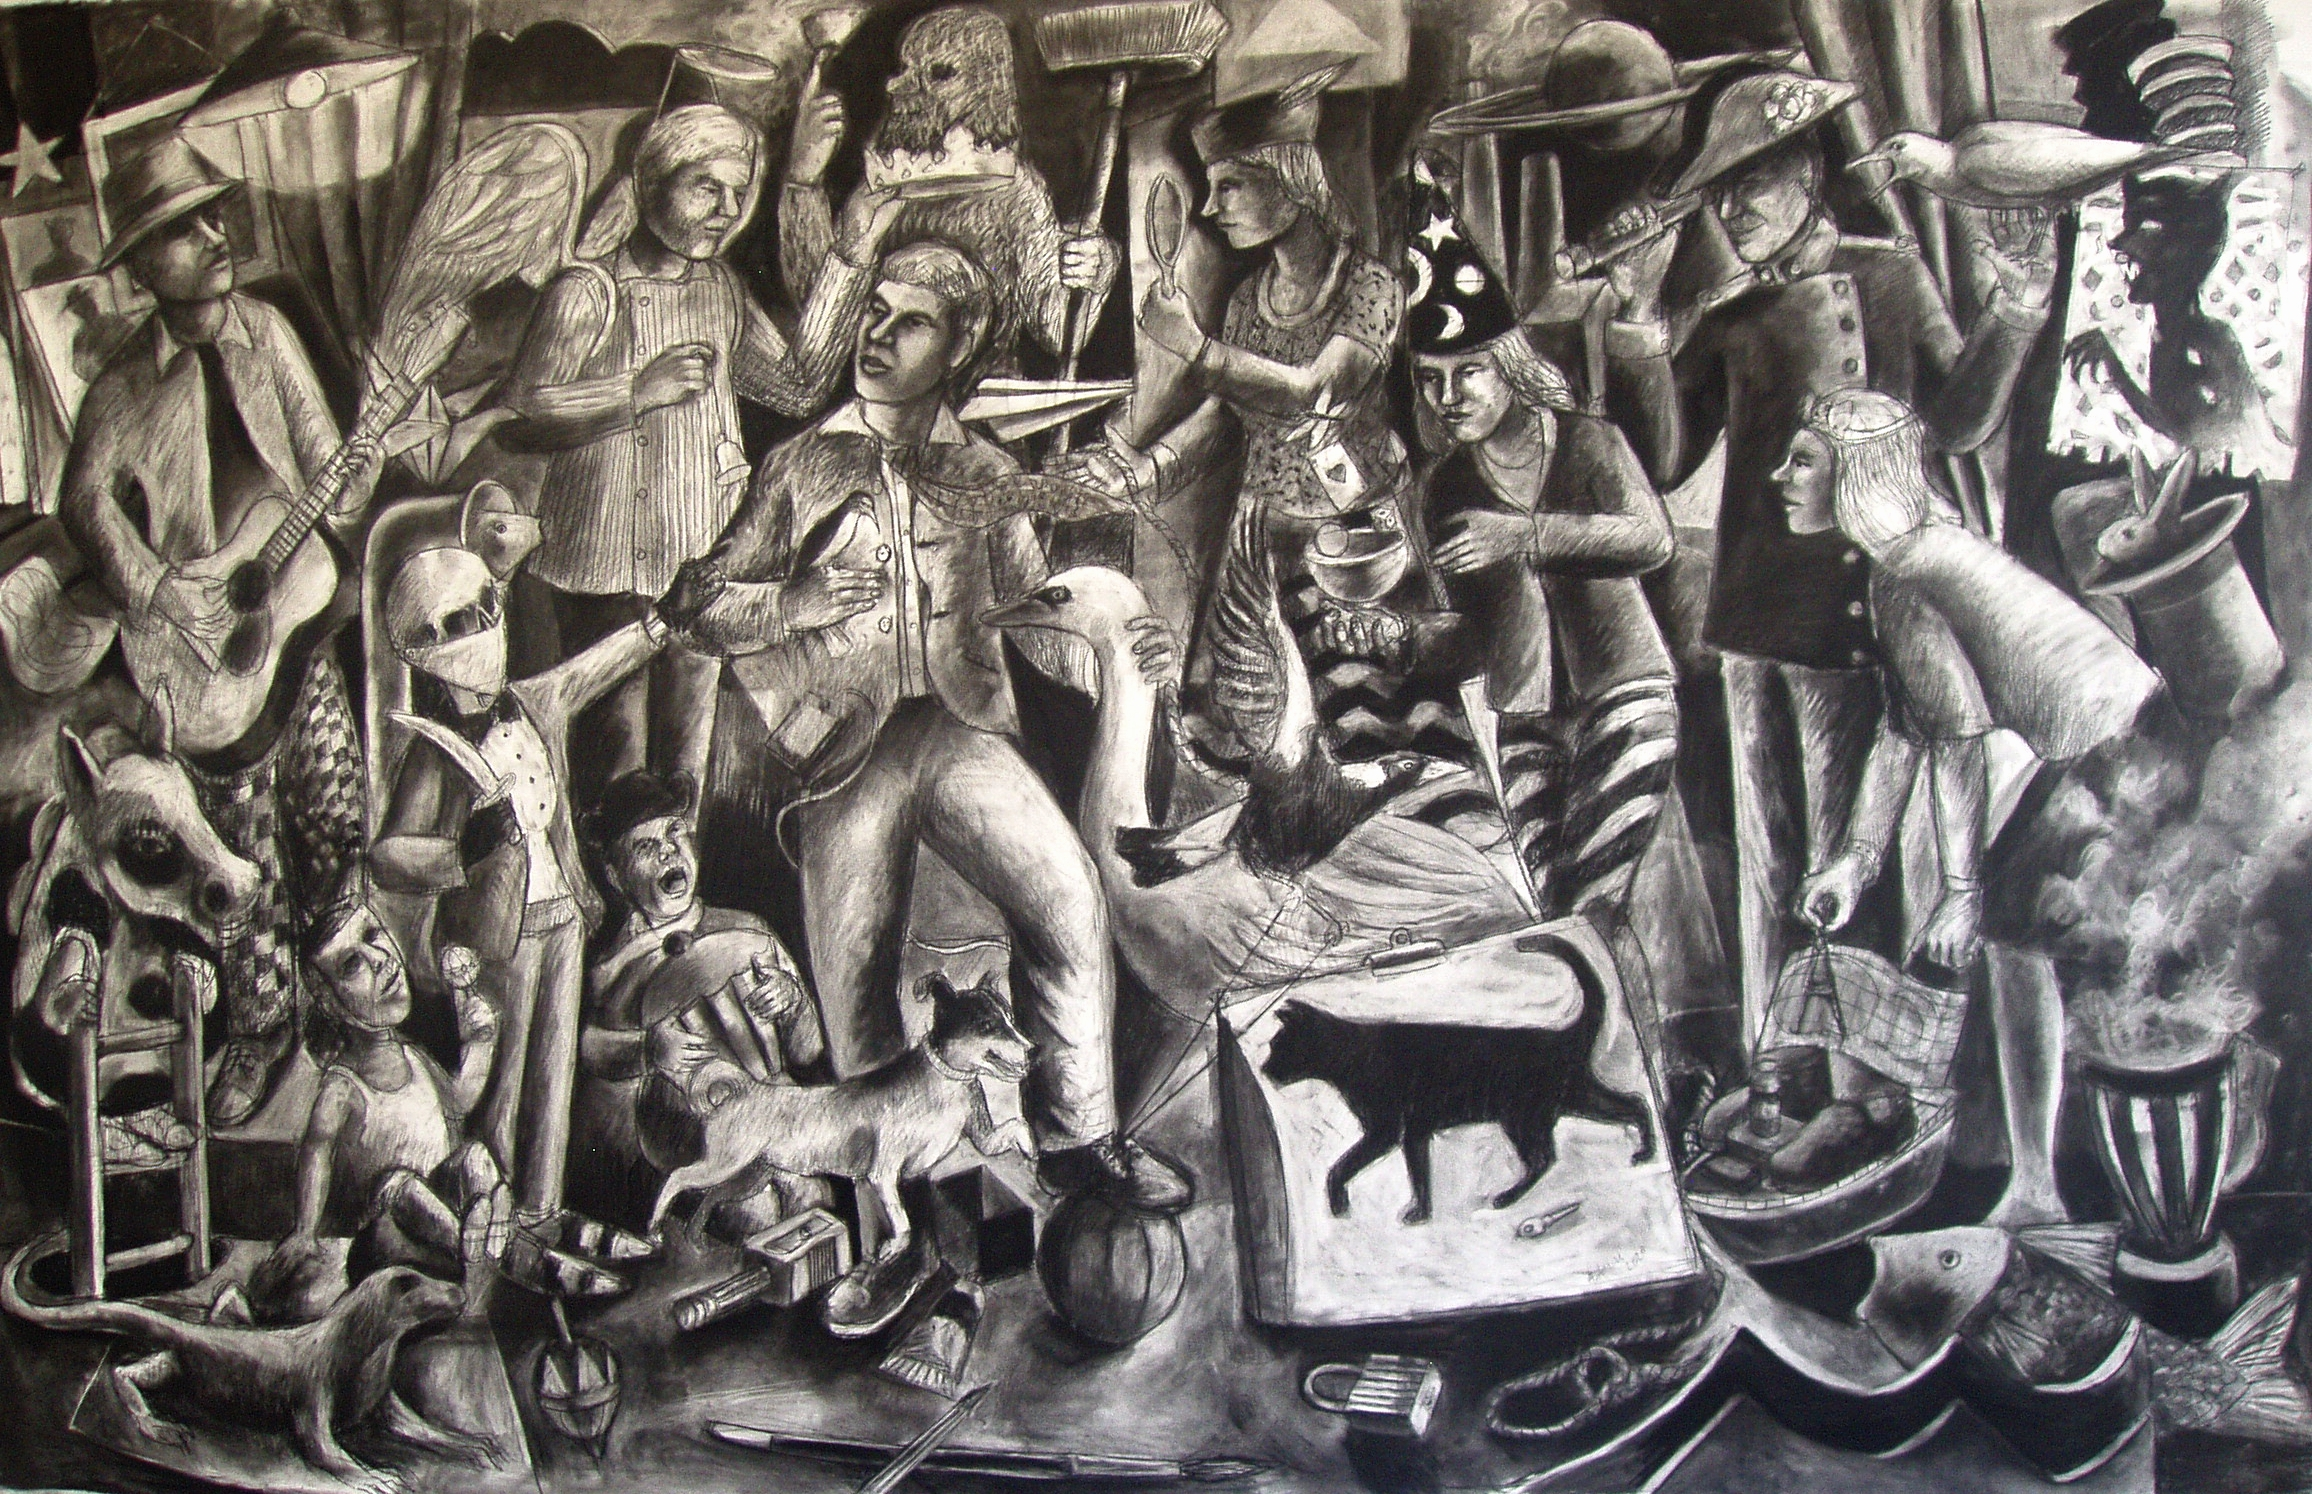 Andrew Antoniou – Finalist in the Fisher's Ghost Art Award 2021